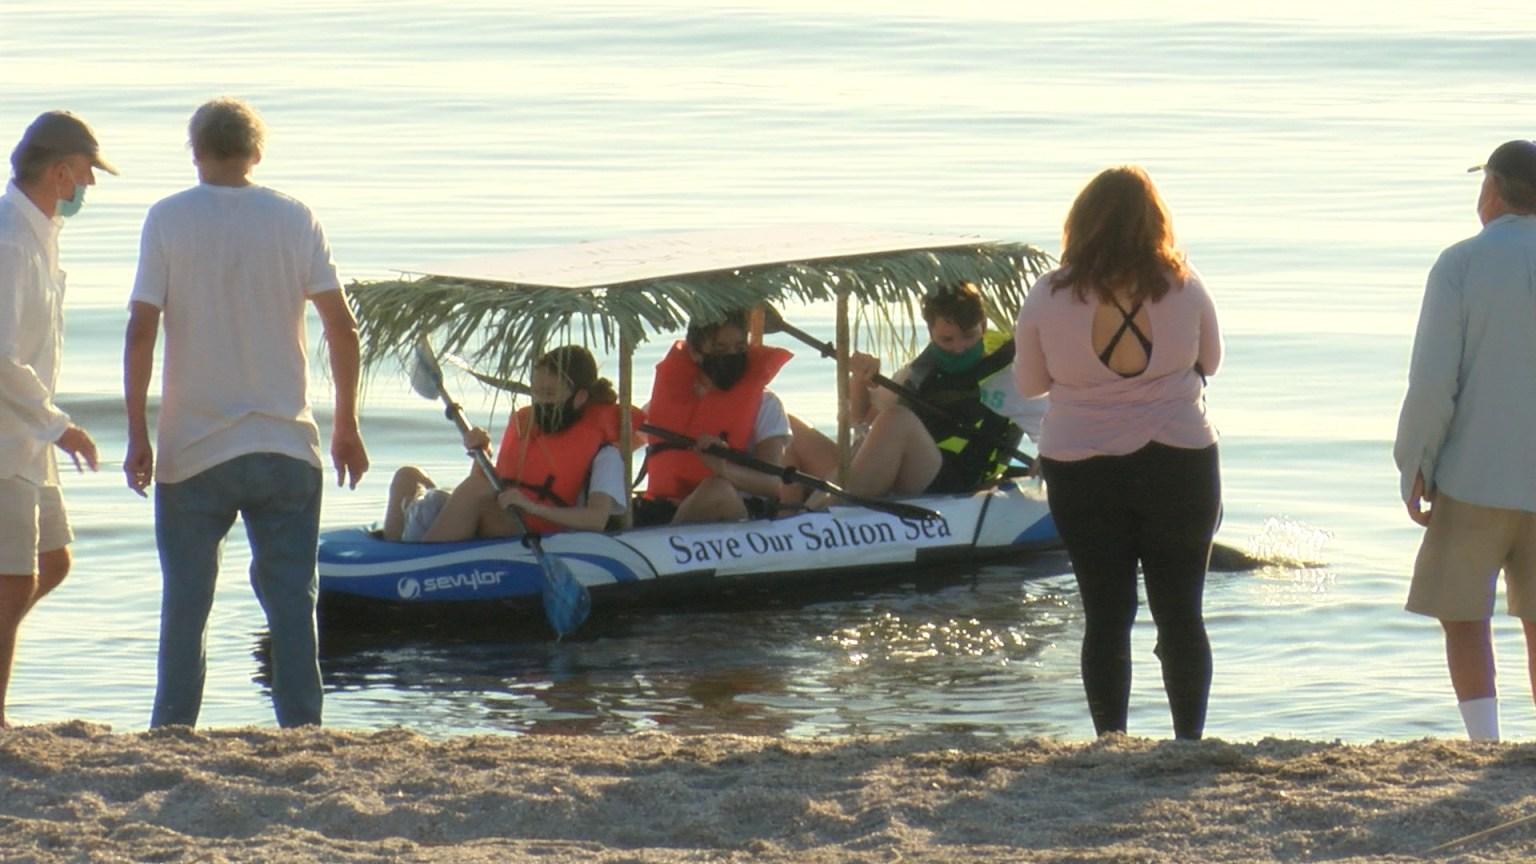 Students Kayak Across The Salton Sea For A Purpose